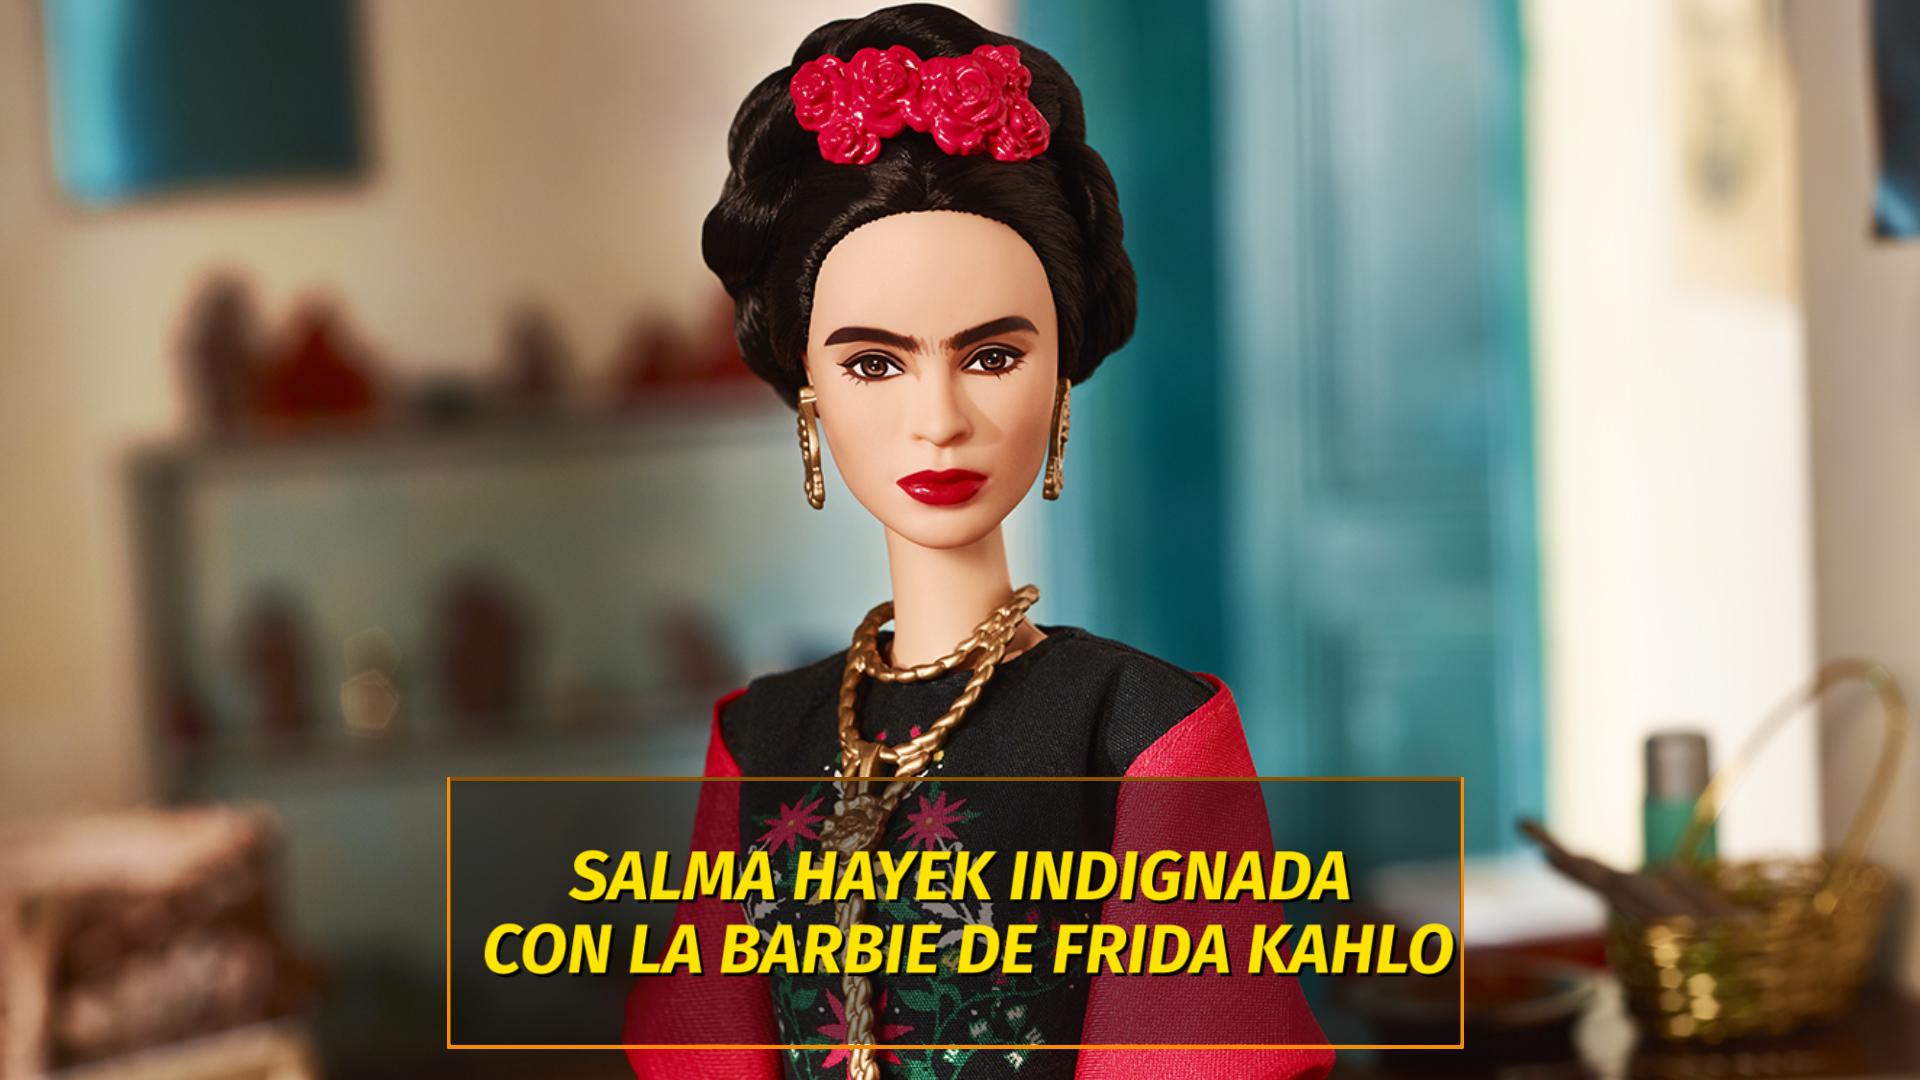 Salma Hayek criticó la nueva Barbie de Frida Kahlo - Infobae